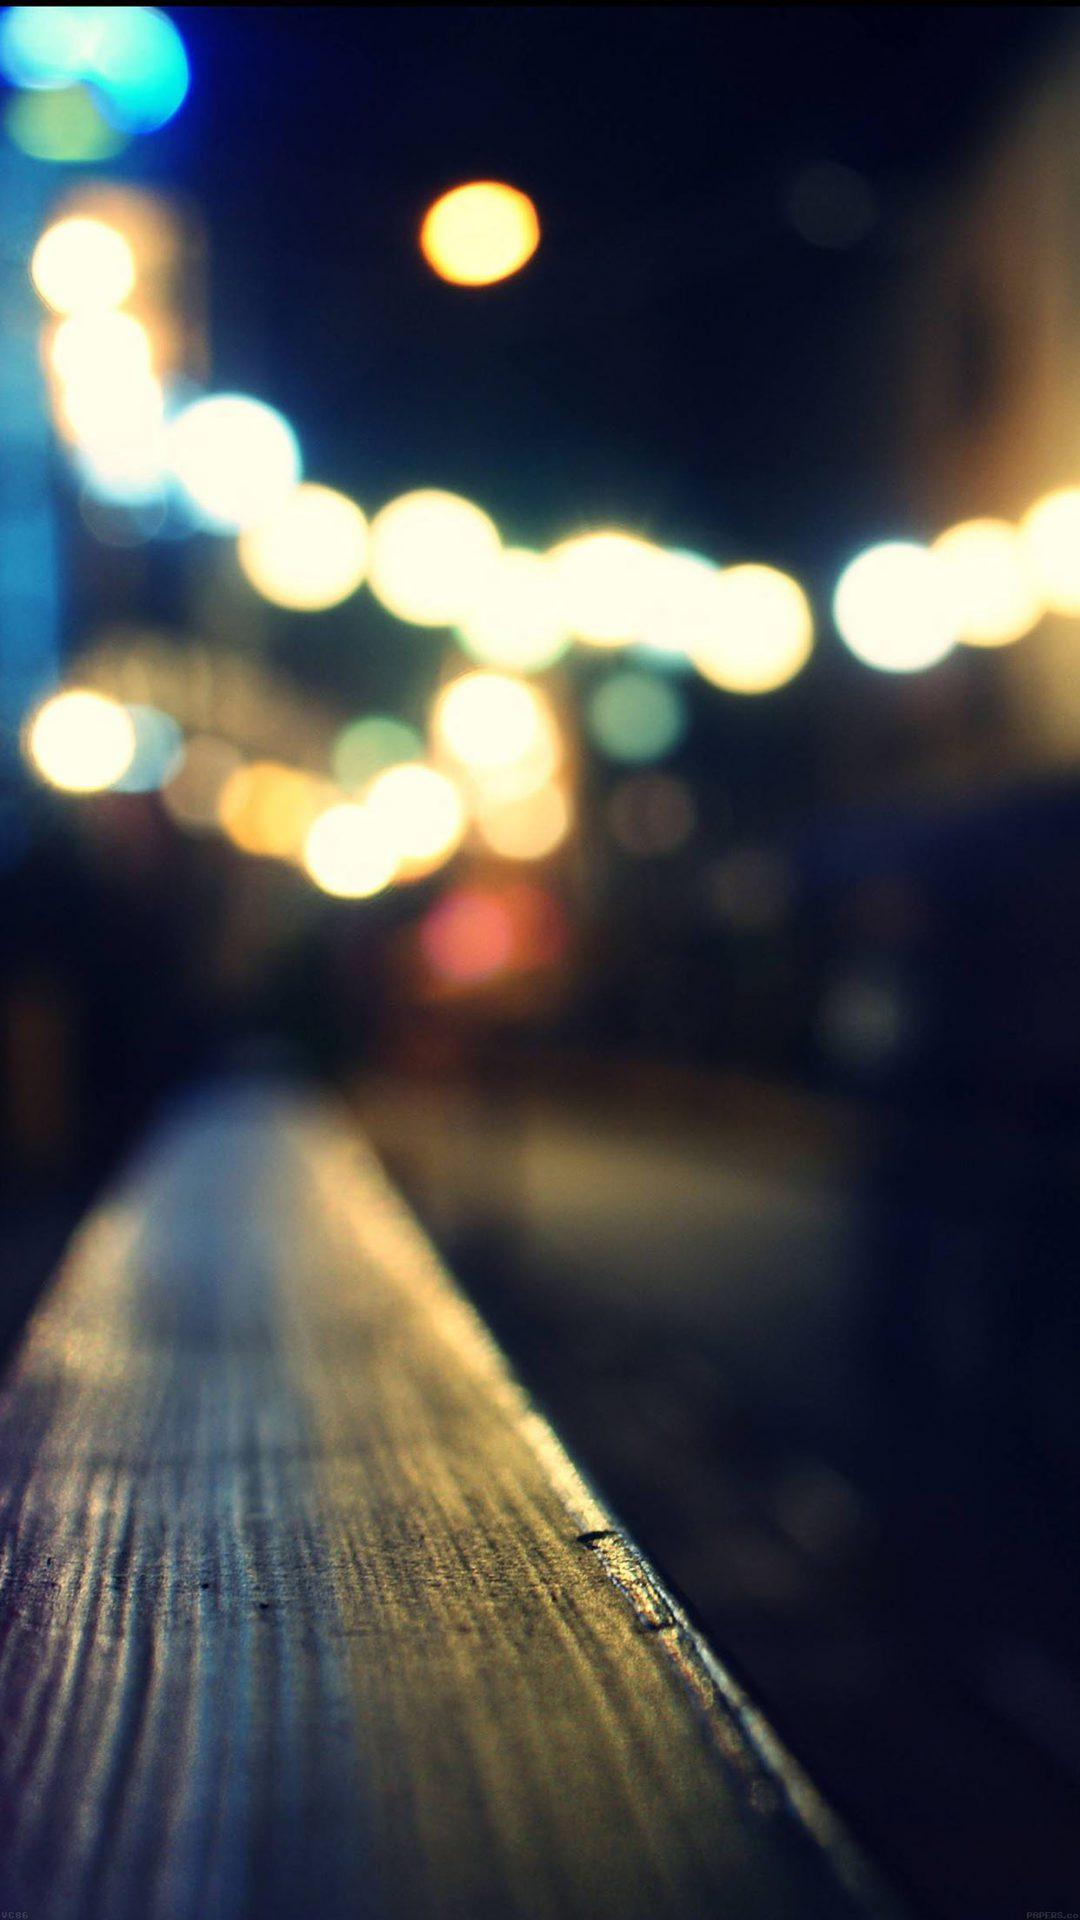 Bokeh Night Siren Lights